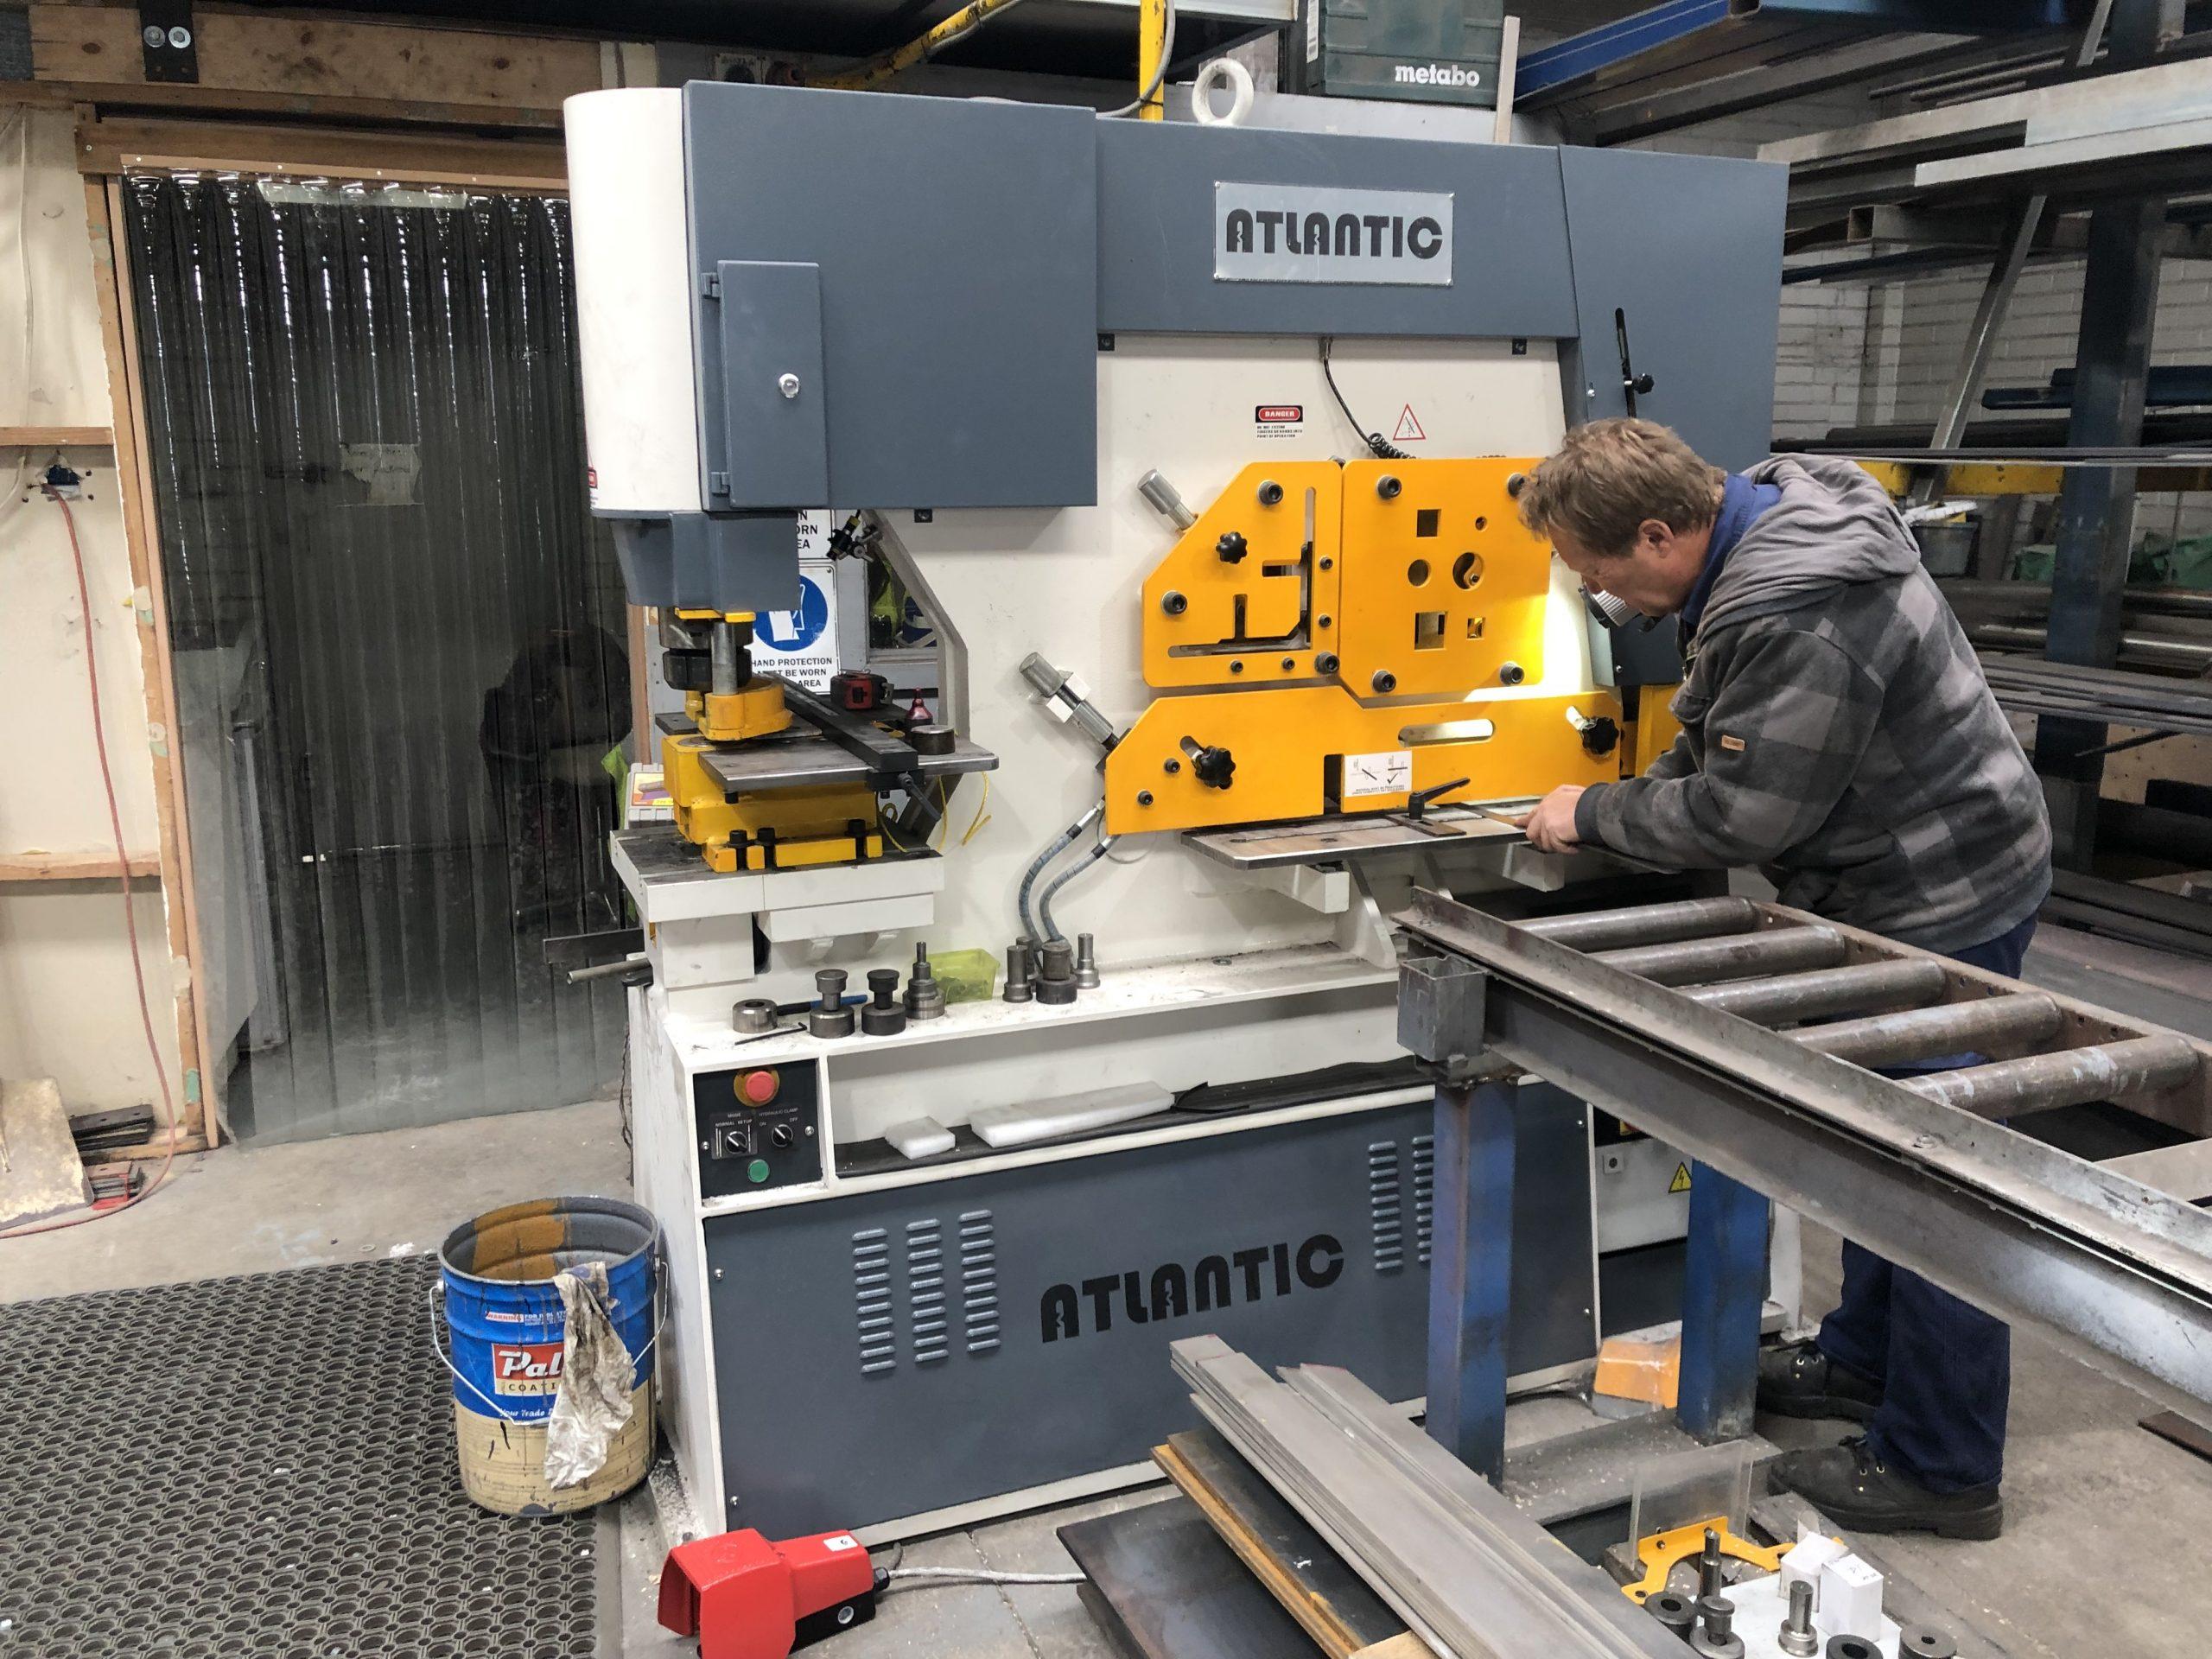 Kingsland Atlantic Multi 125 Iron Worker For Sale In Australia 1